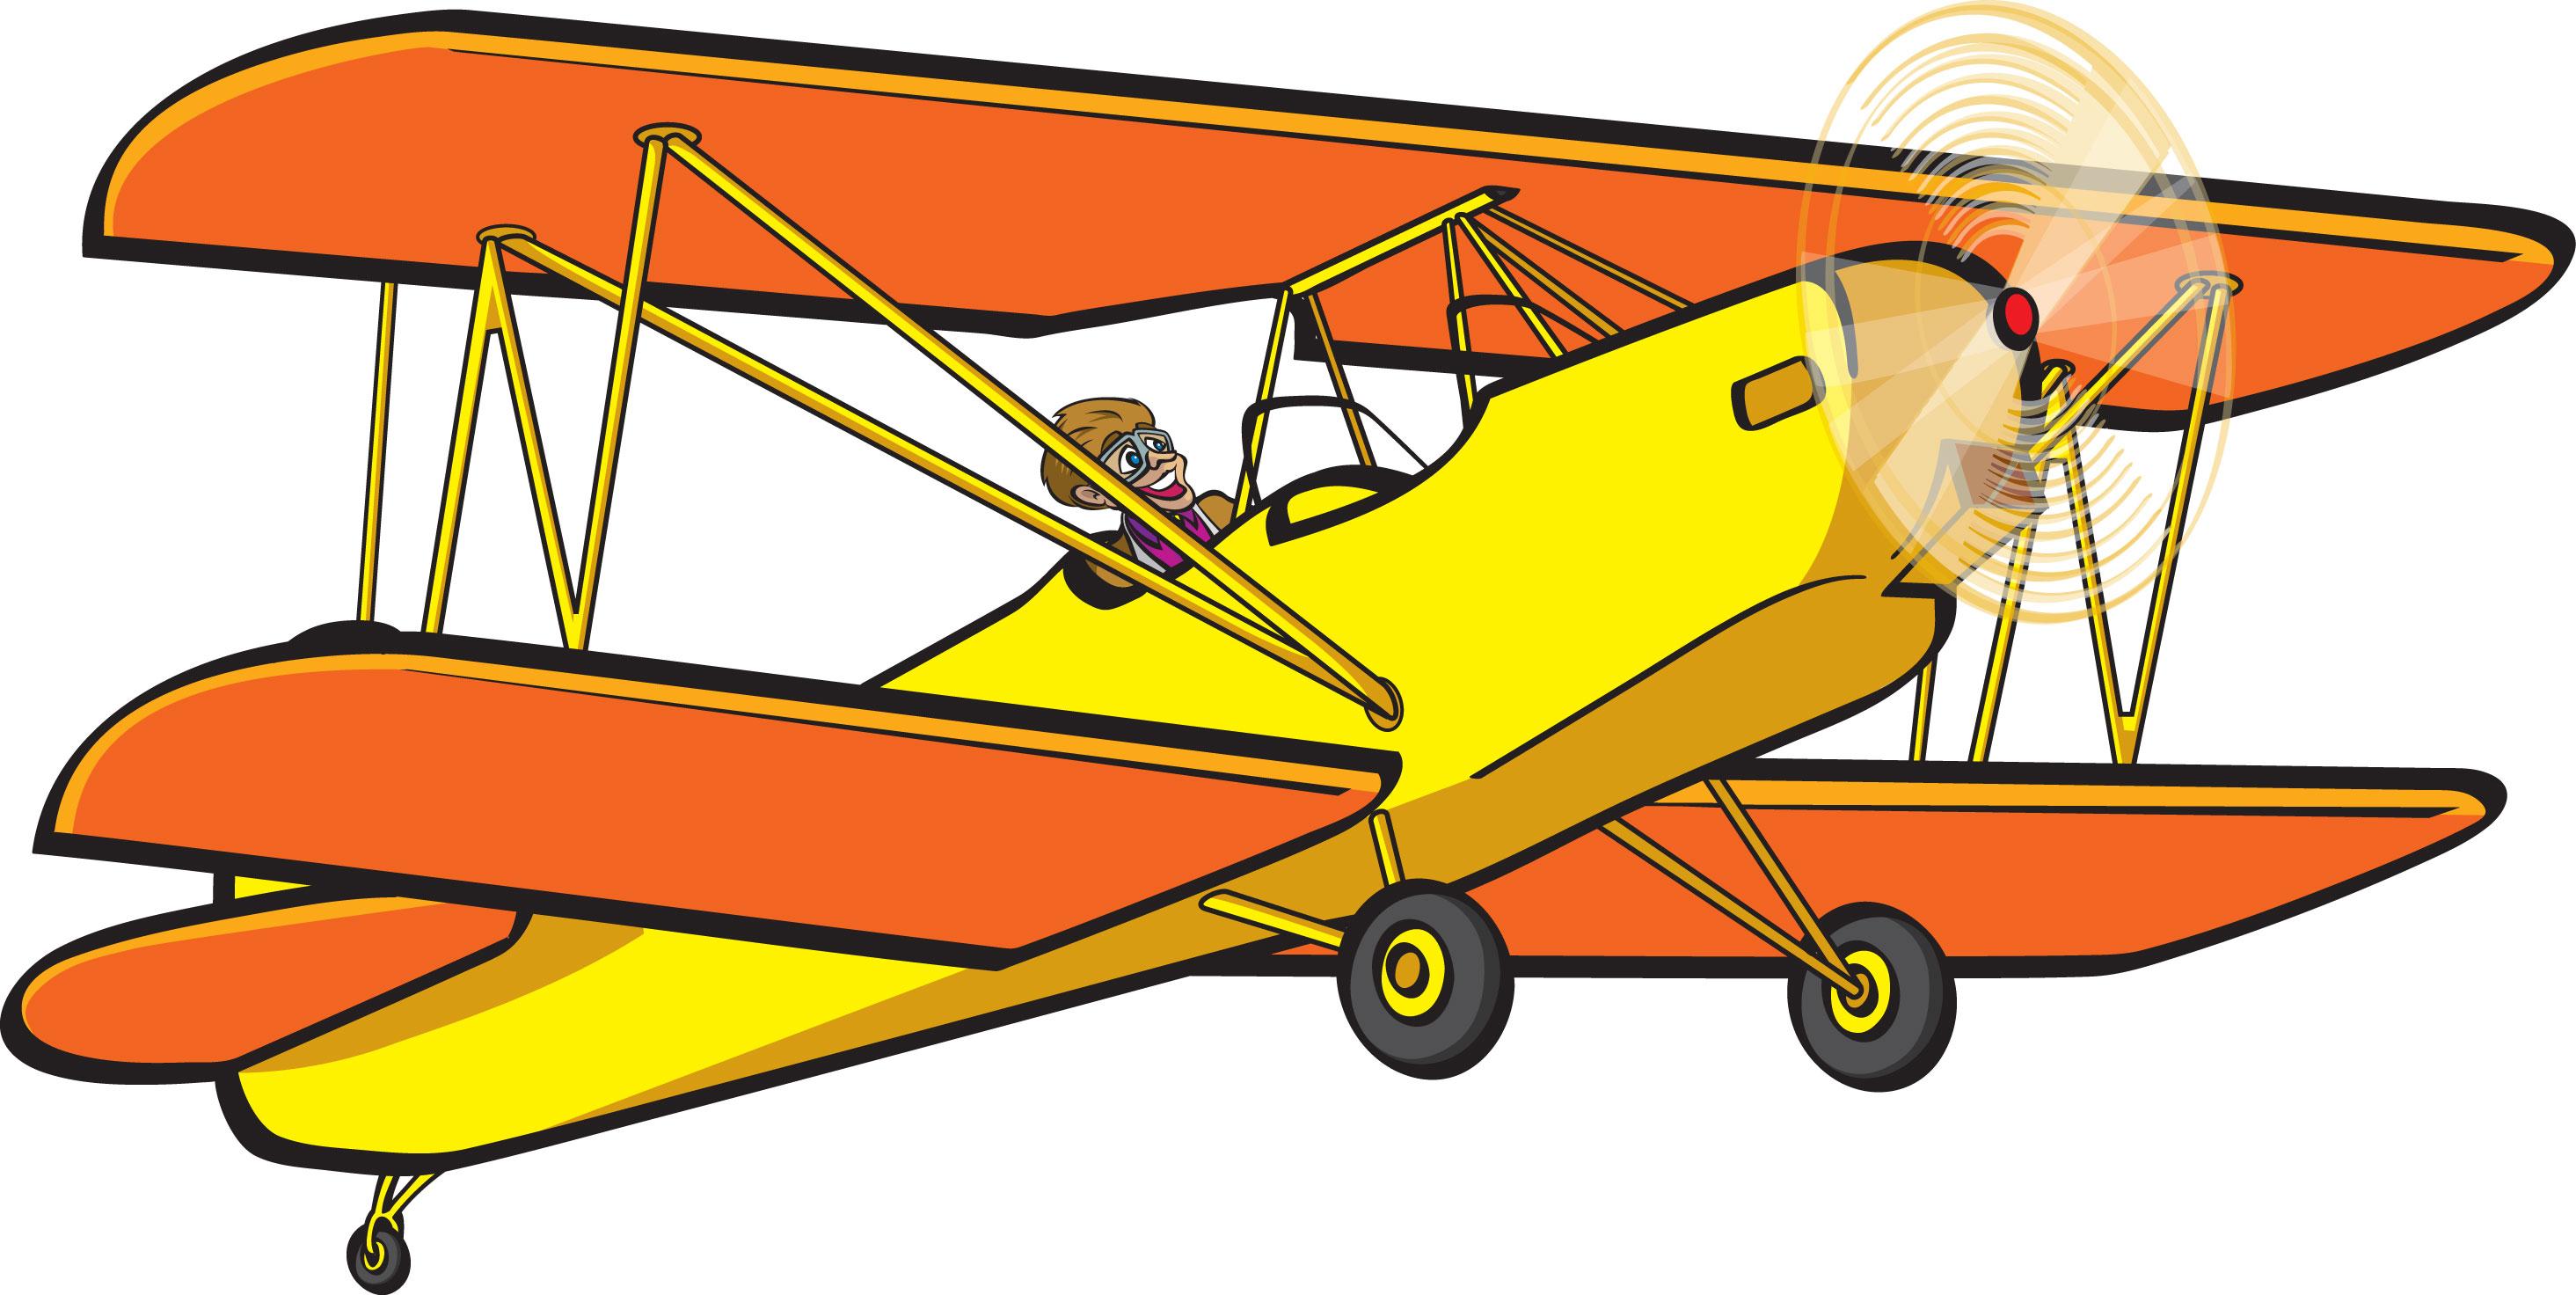 vintage biplane clipart save our oceans rh saveouroceans info